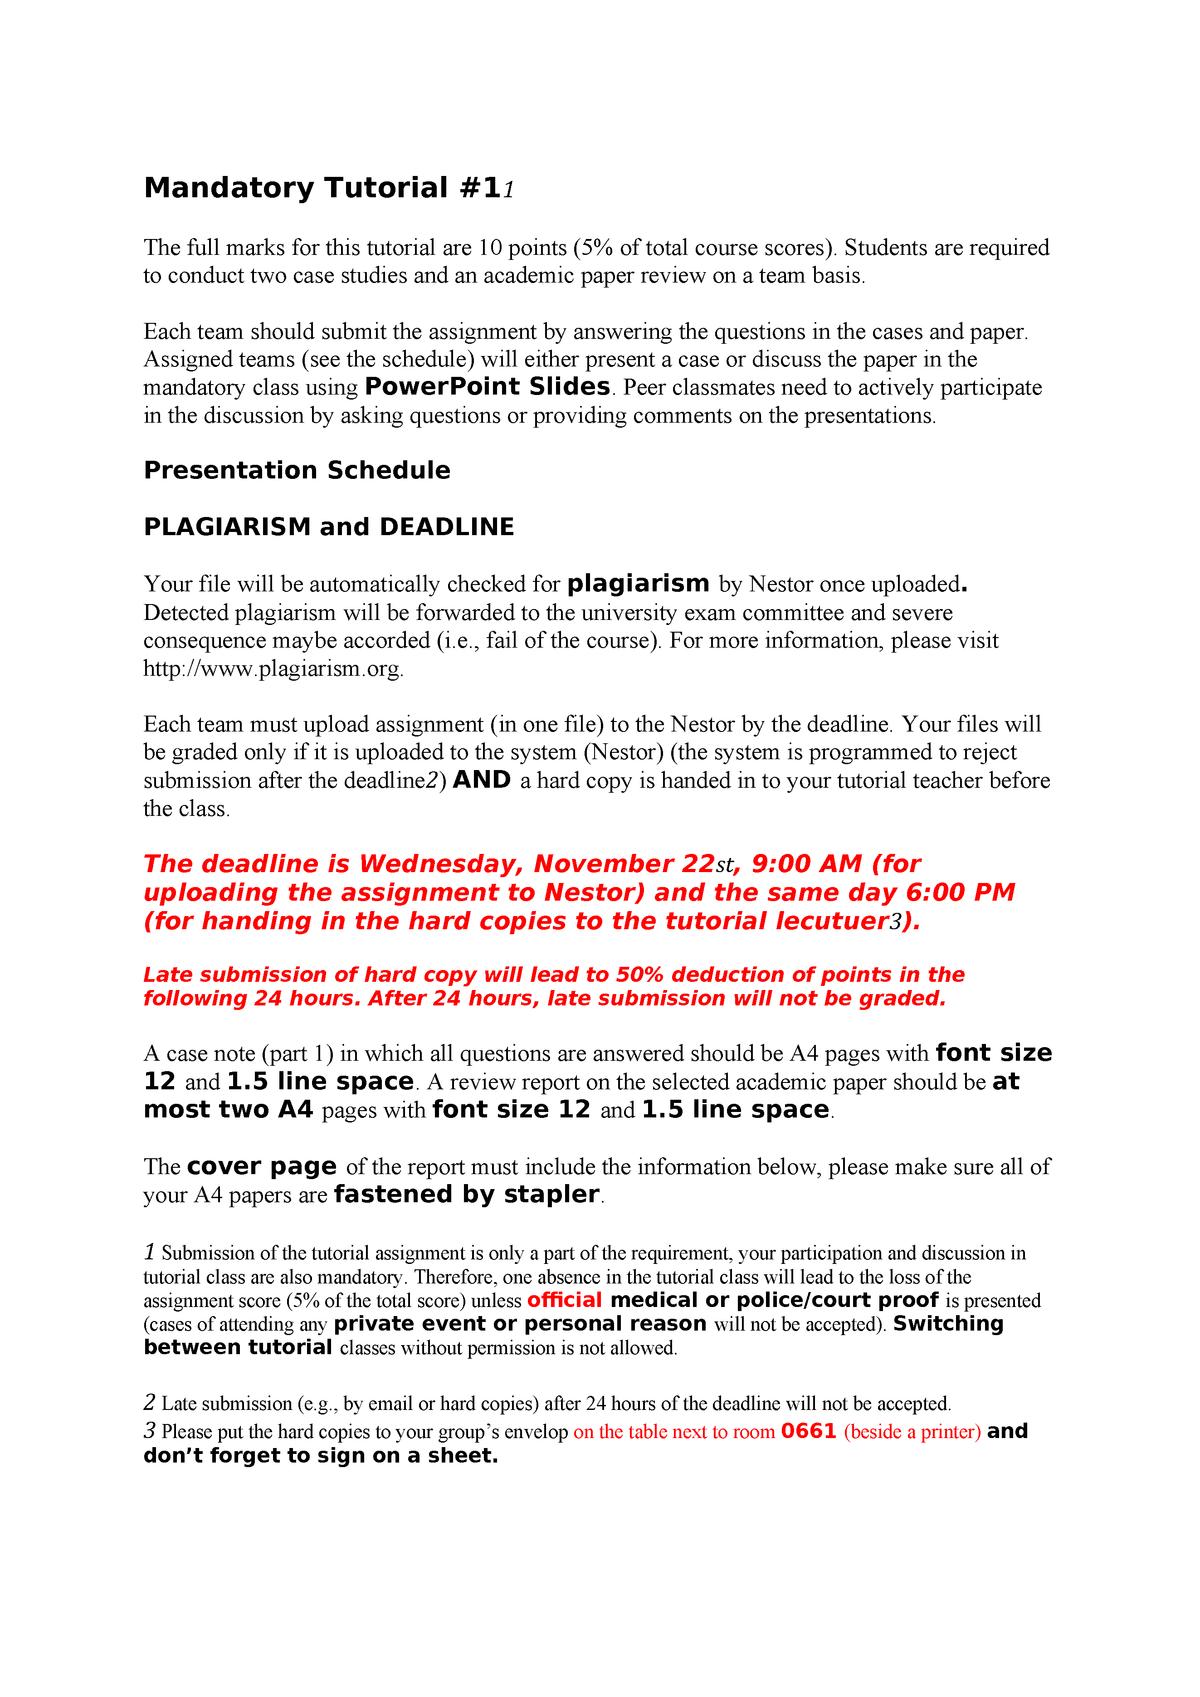 Mandatory Tutorial - EBB068A05: Operations and Logistics